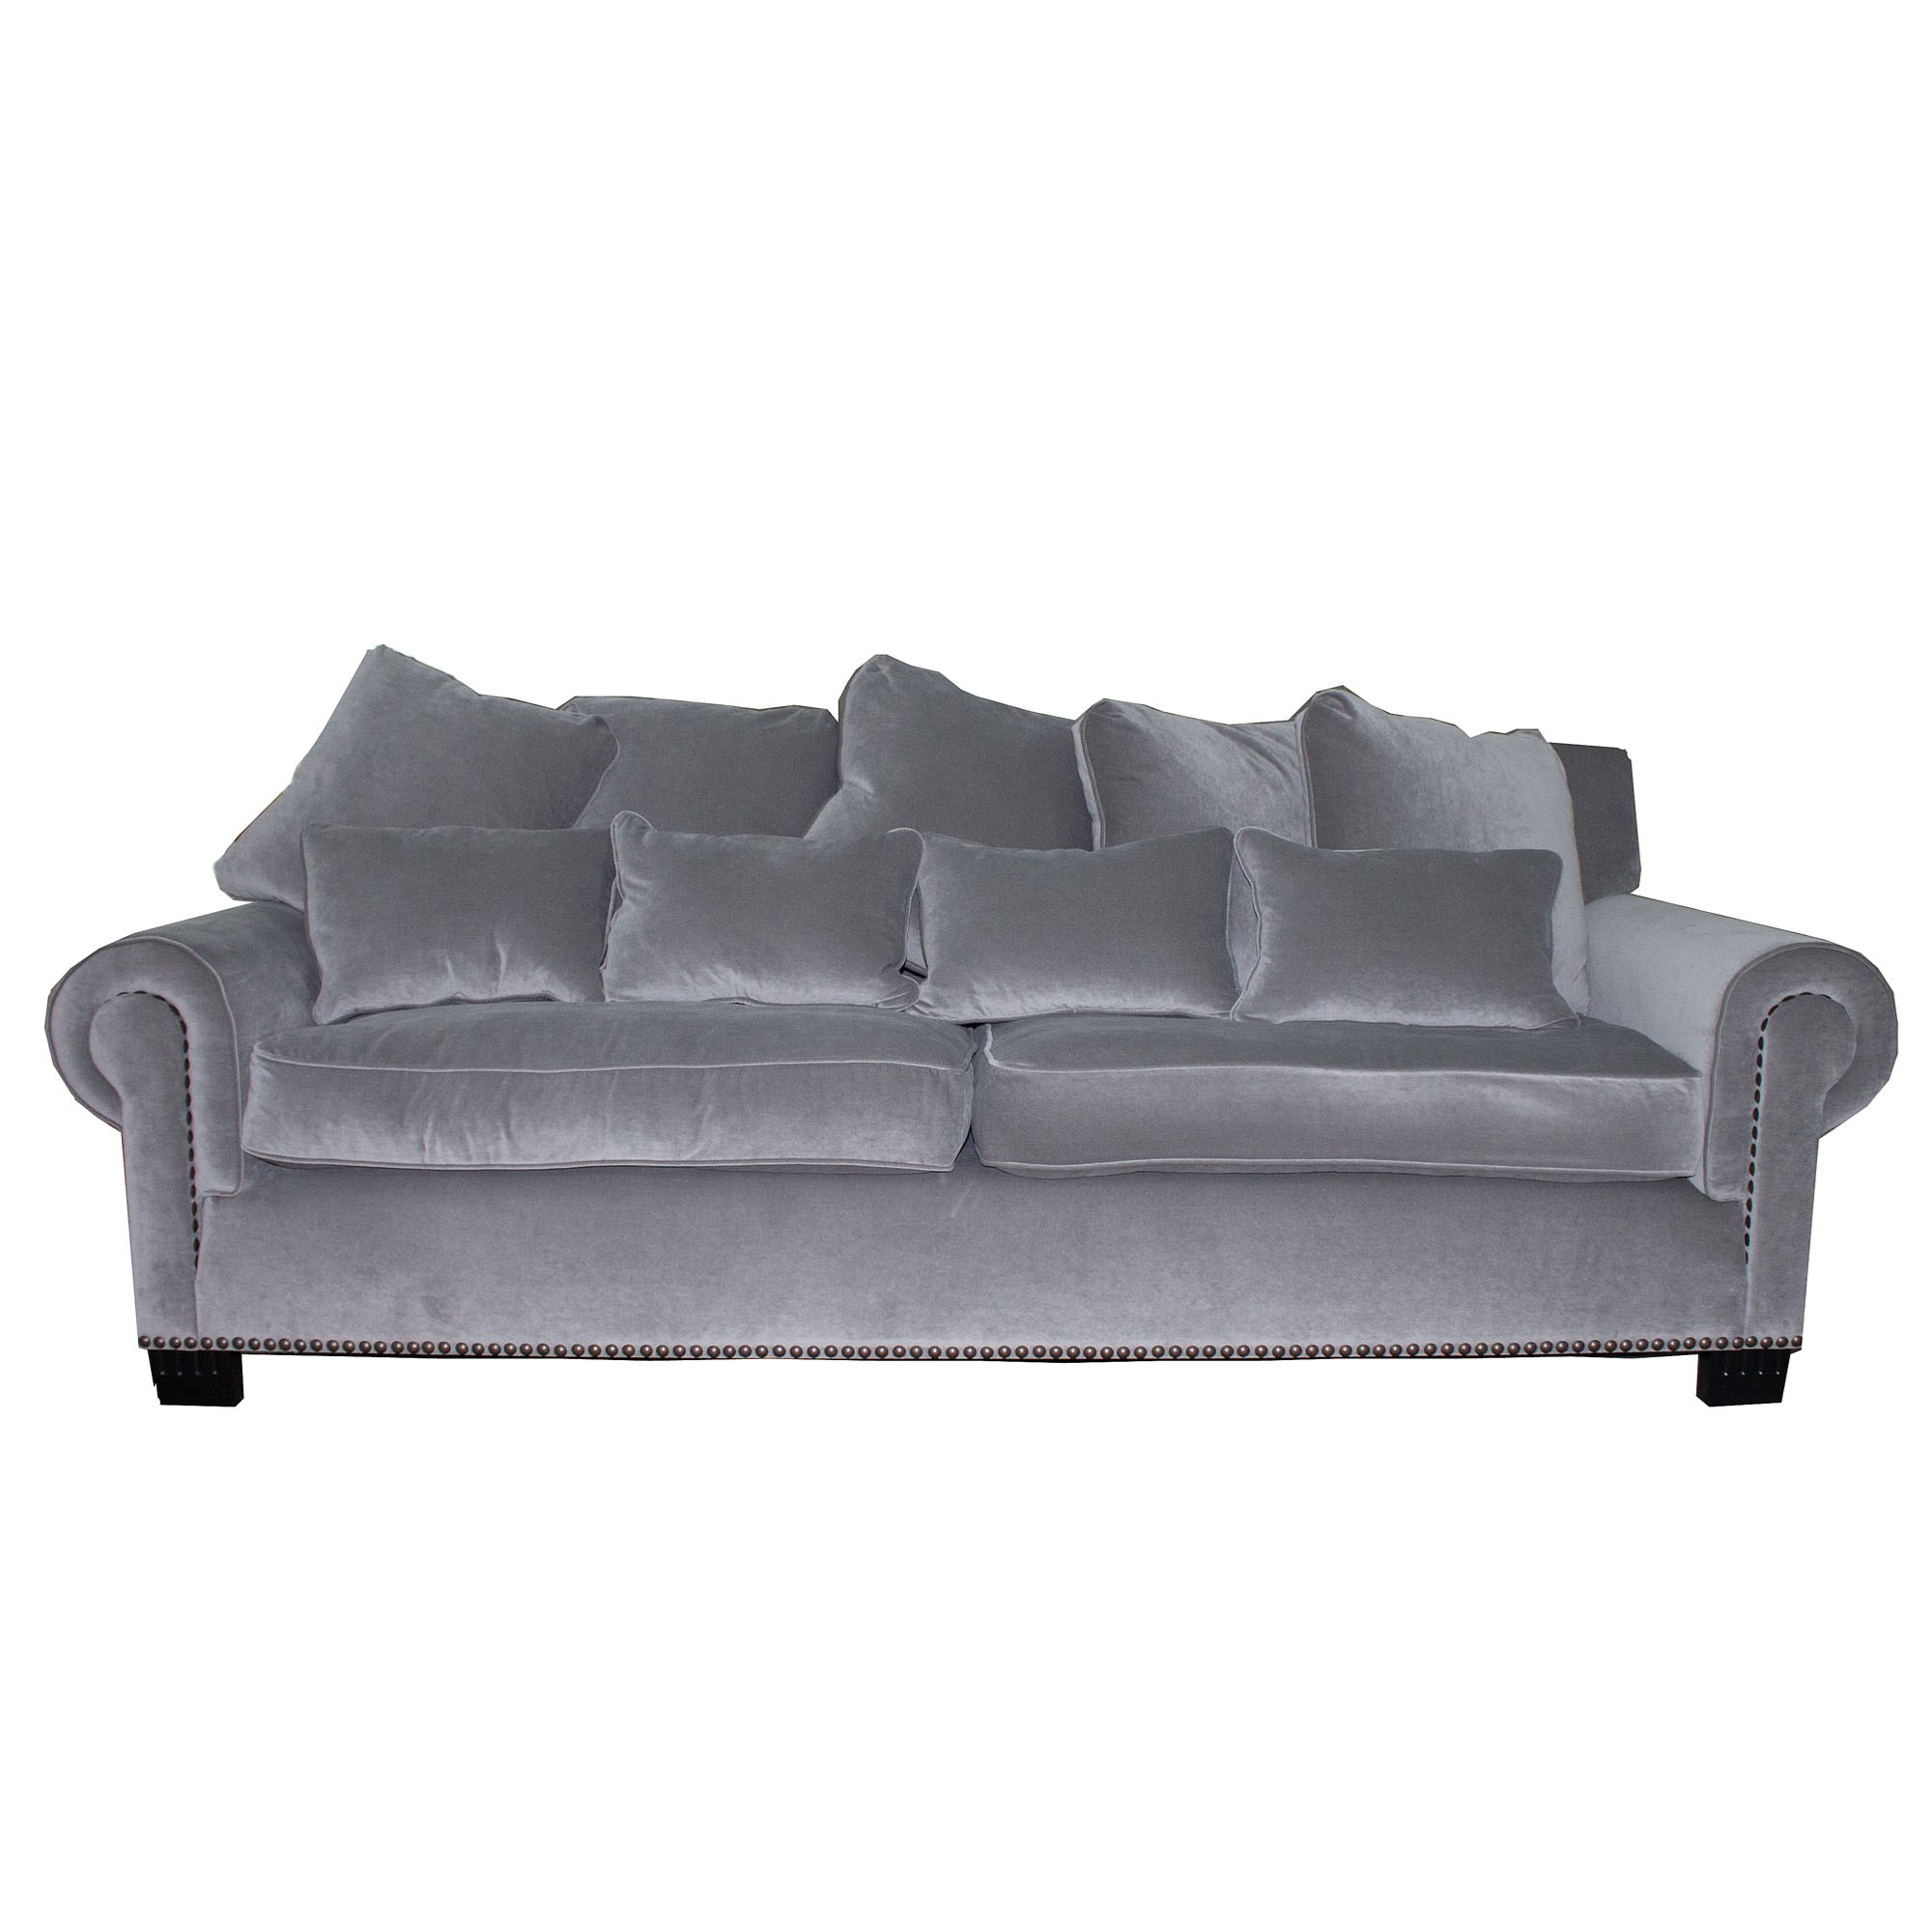 Delightful Hanover Sofa